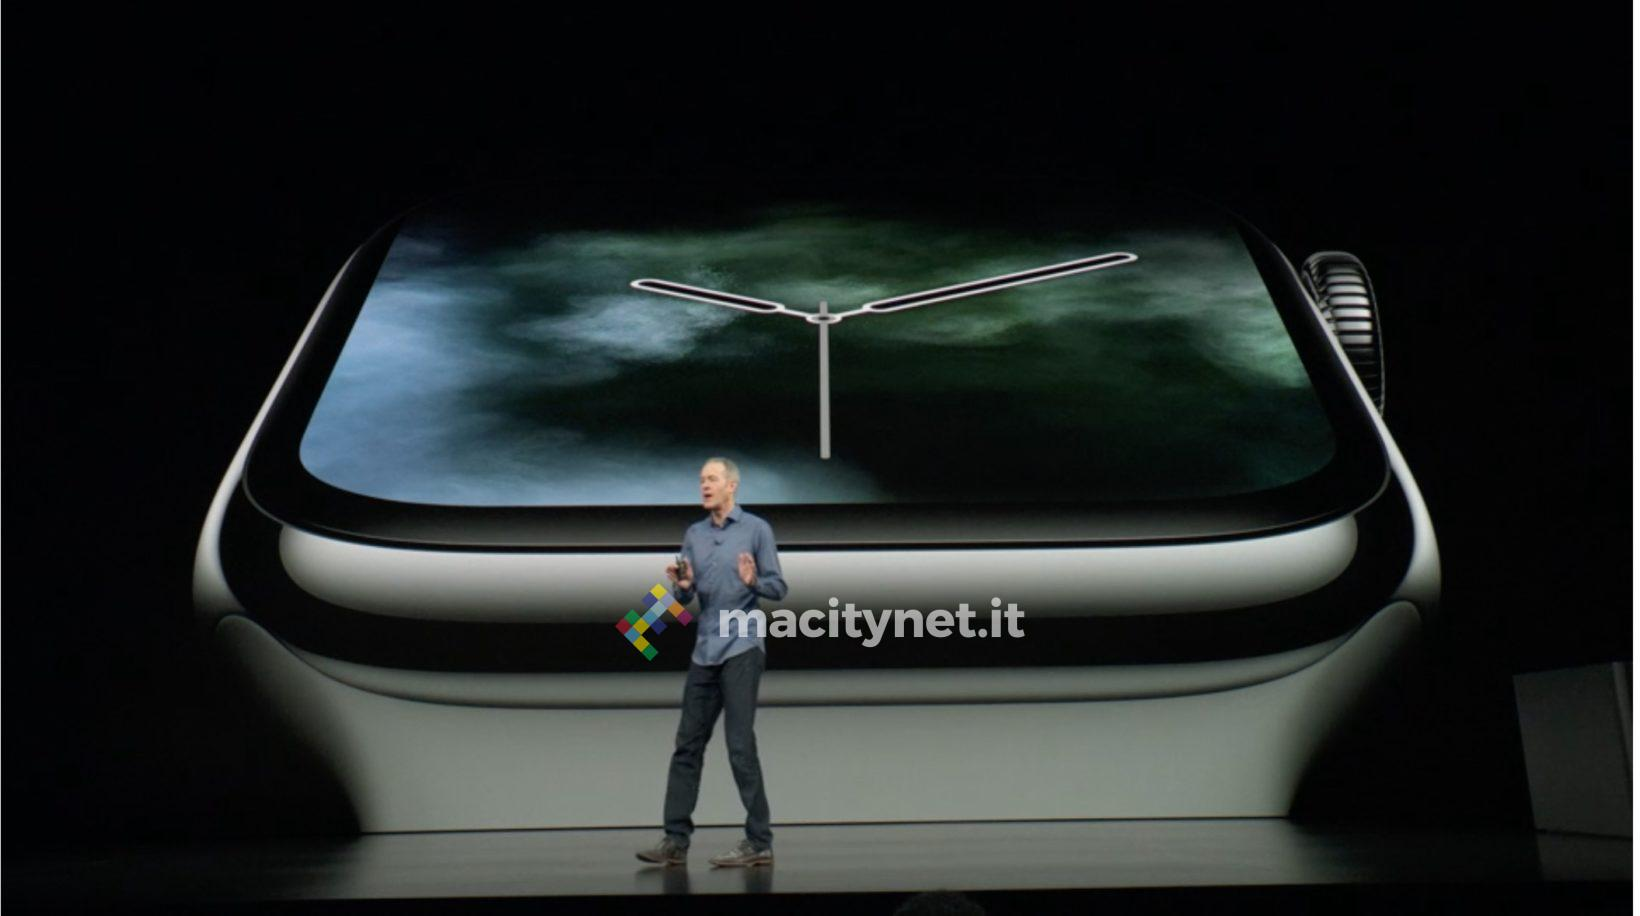 sfondi apple watch 4 foto keynote apple 12 settembre